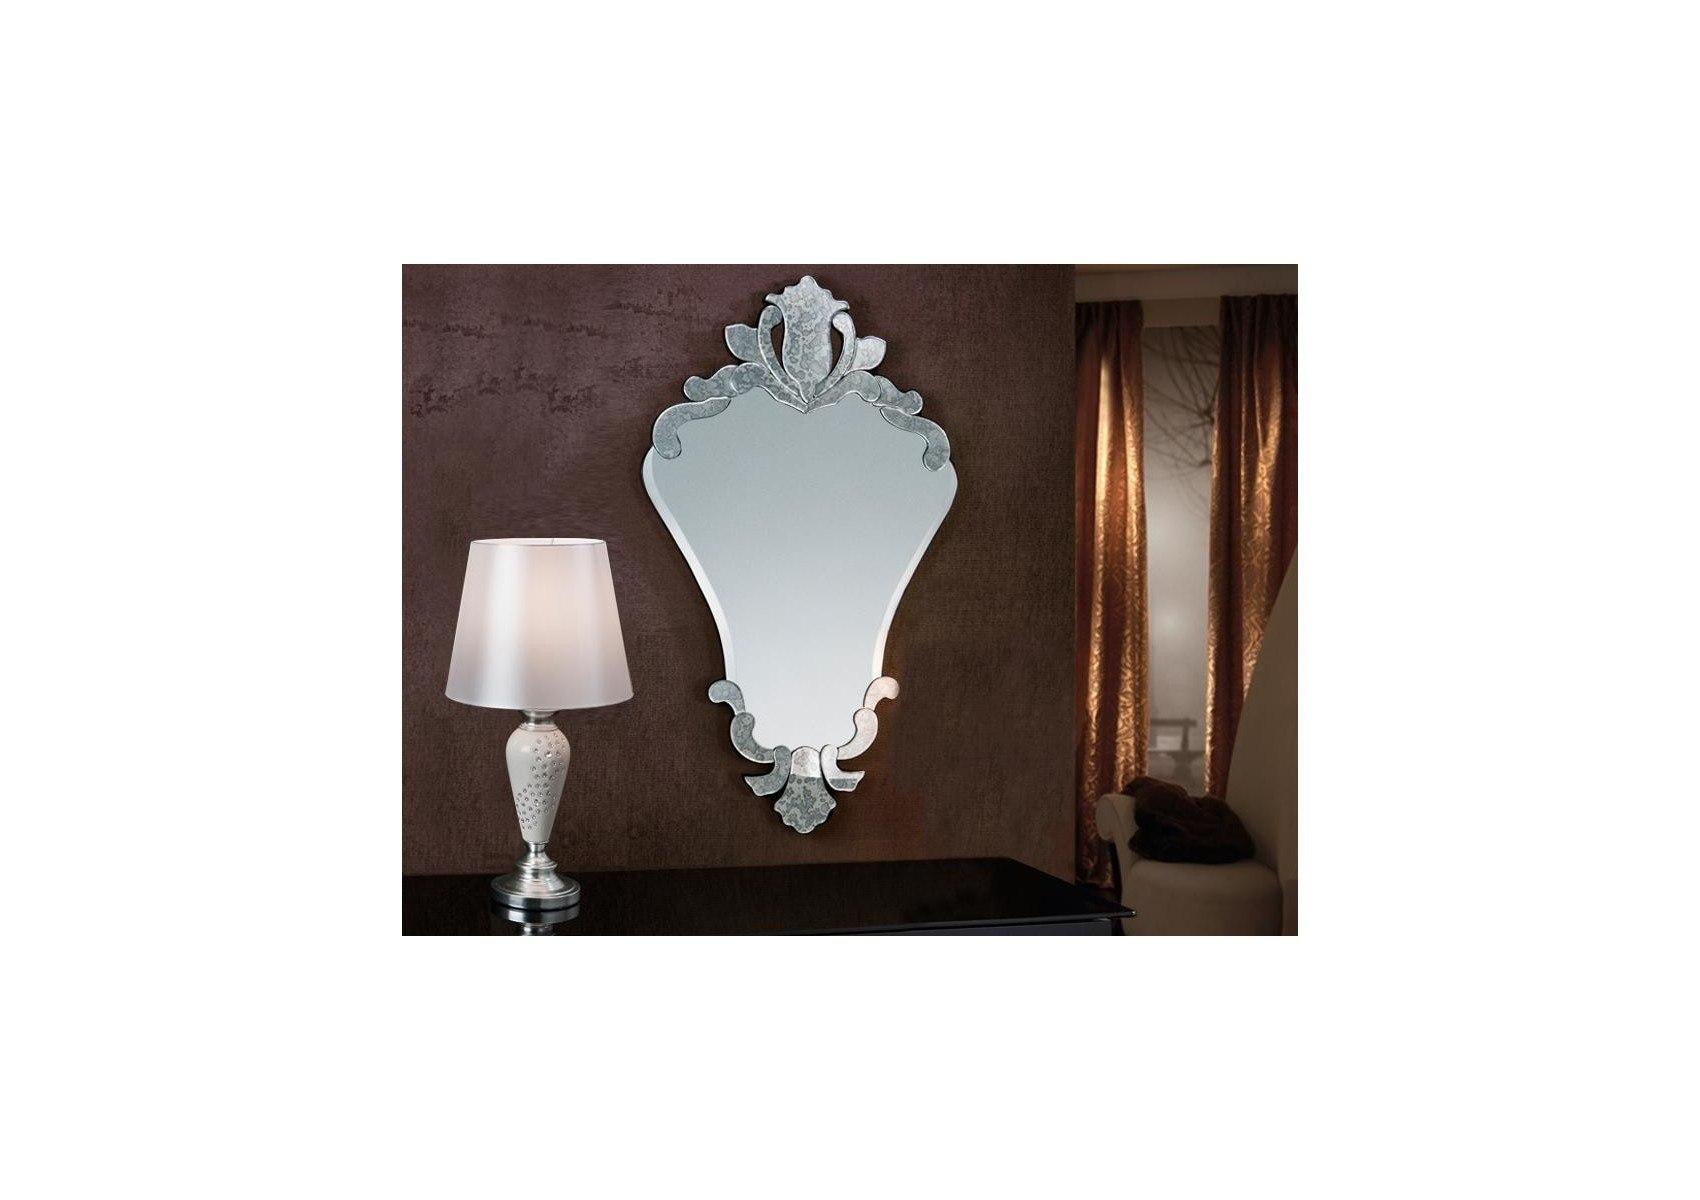 miroir original agnes deco design schuller boite design. Black Bedroom Furniture Sets. Home Design Ideas